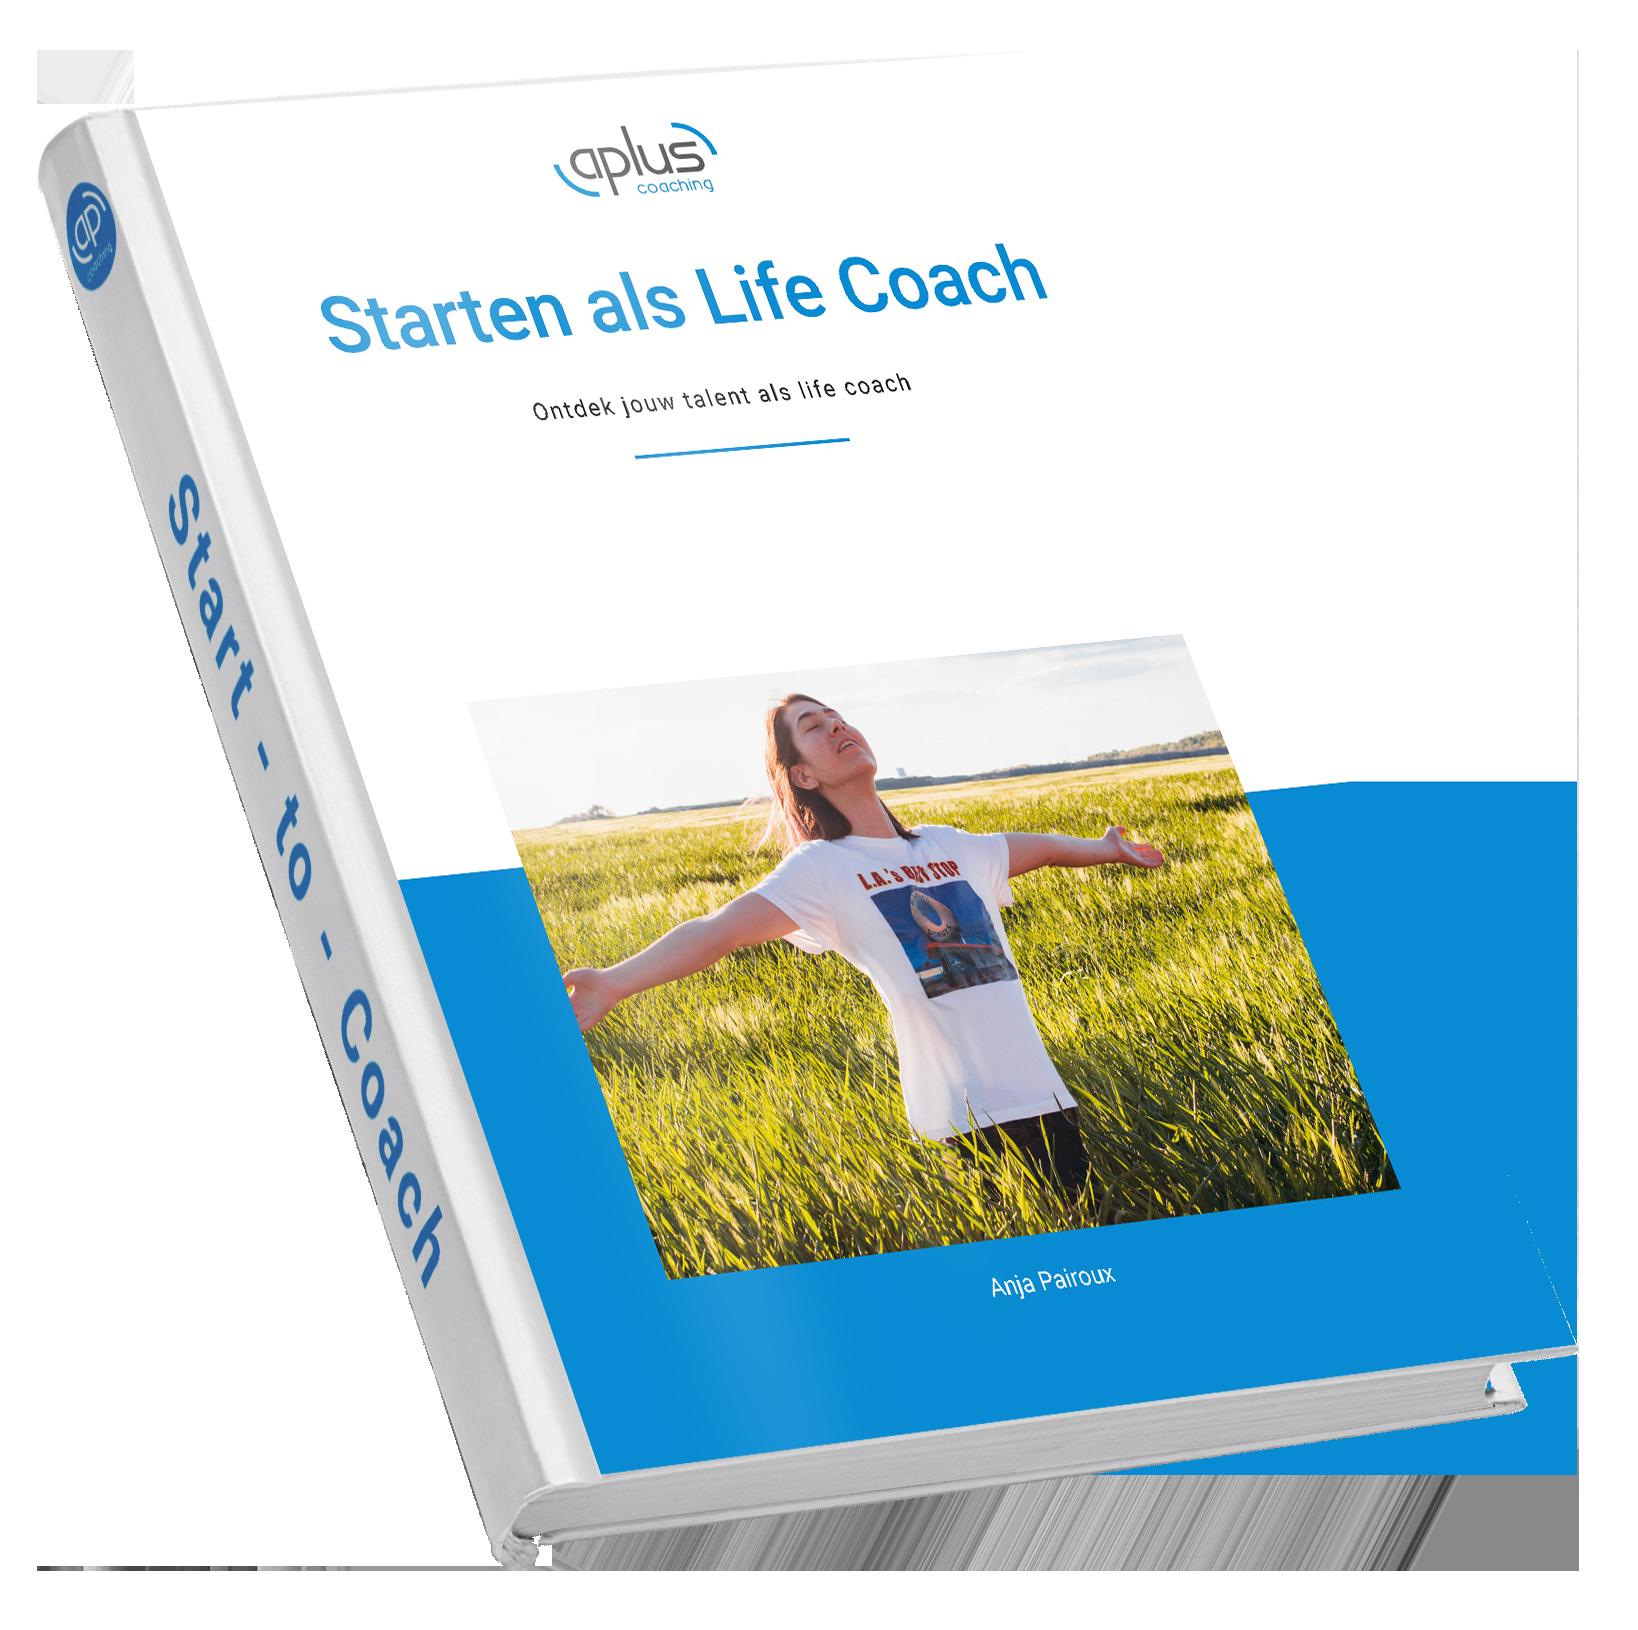 Apluscoaching |Starten Als Life Coach | Coaching Opleiding